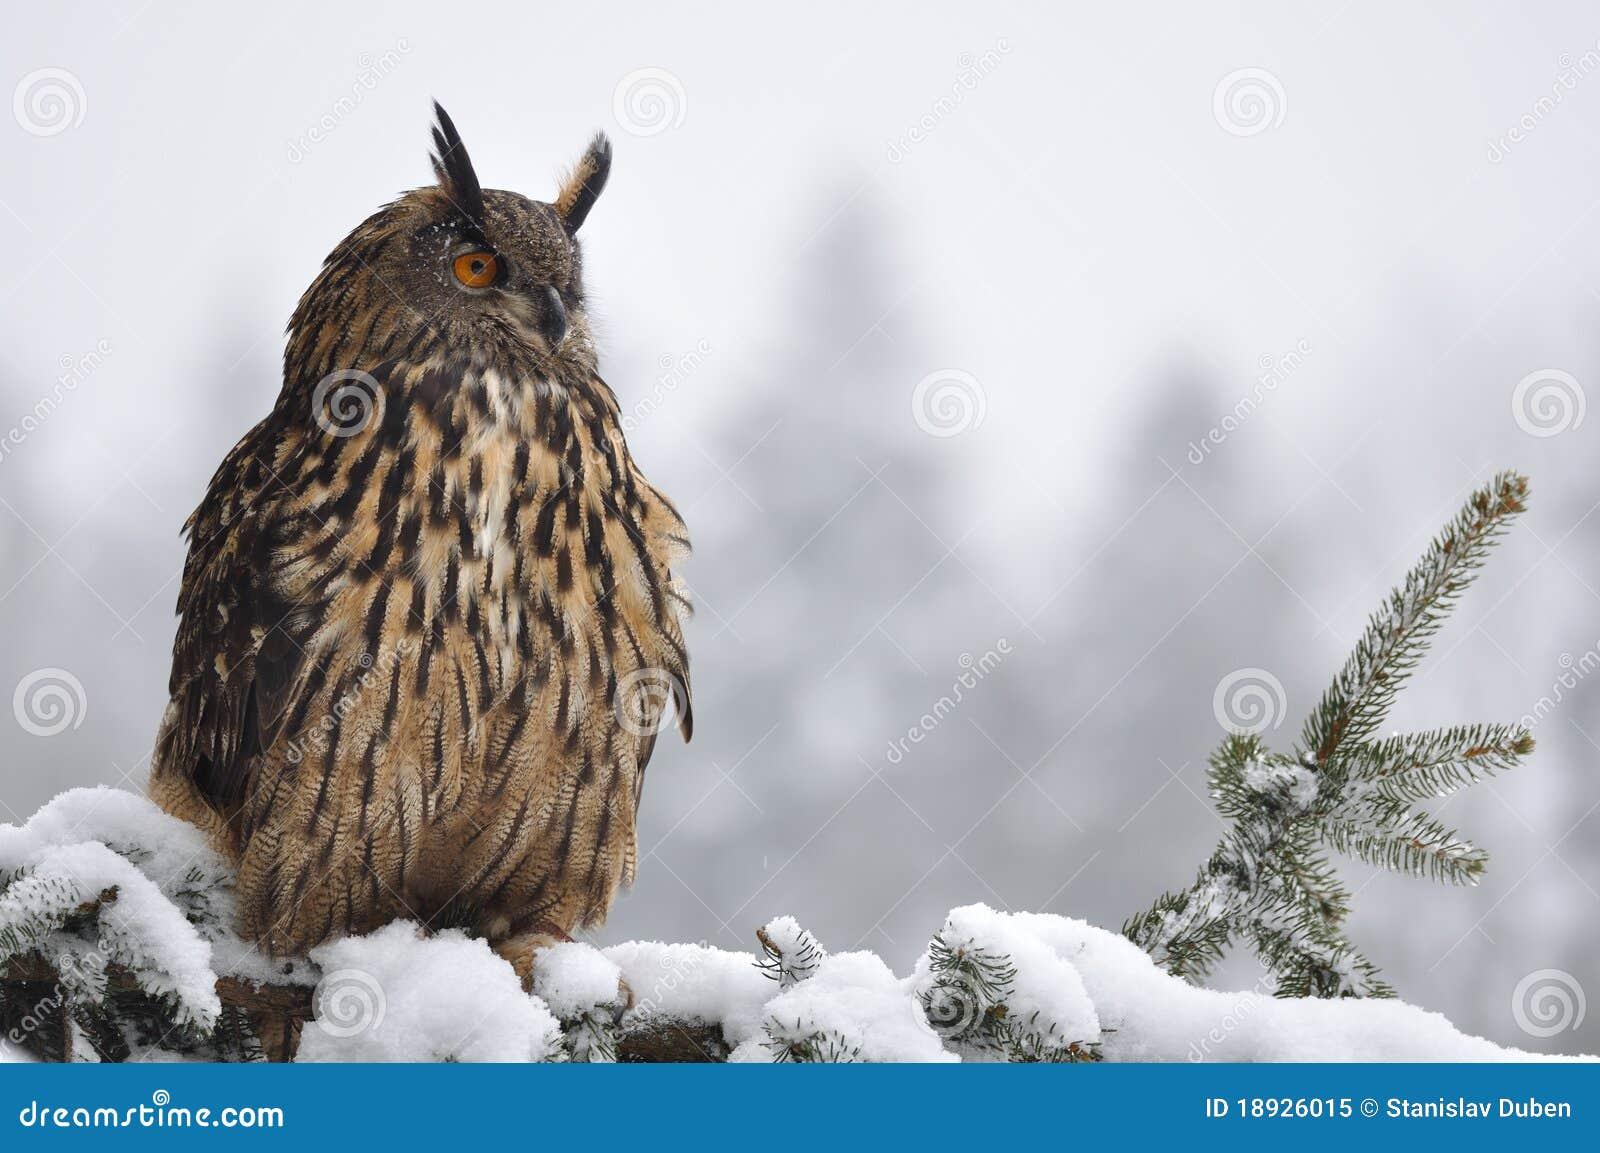 Eurasian Eagle Owl sitting on coniferous tree